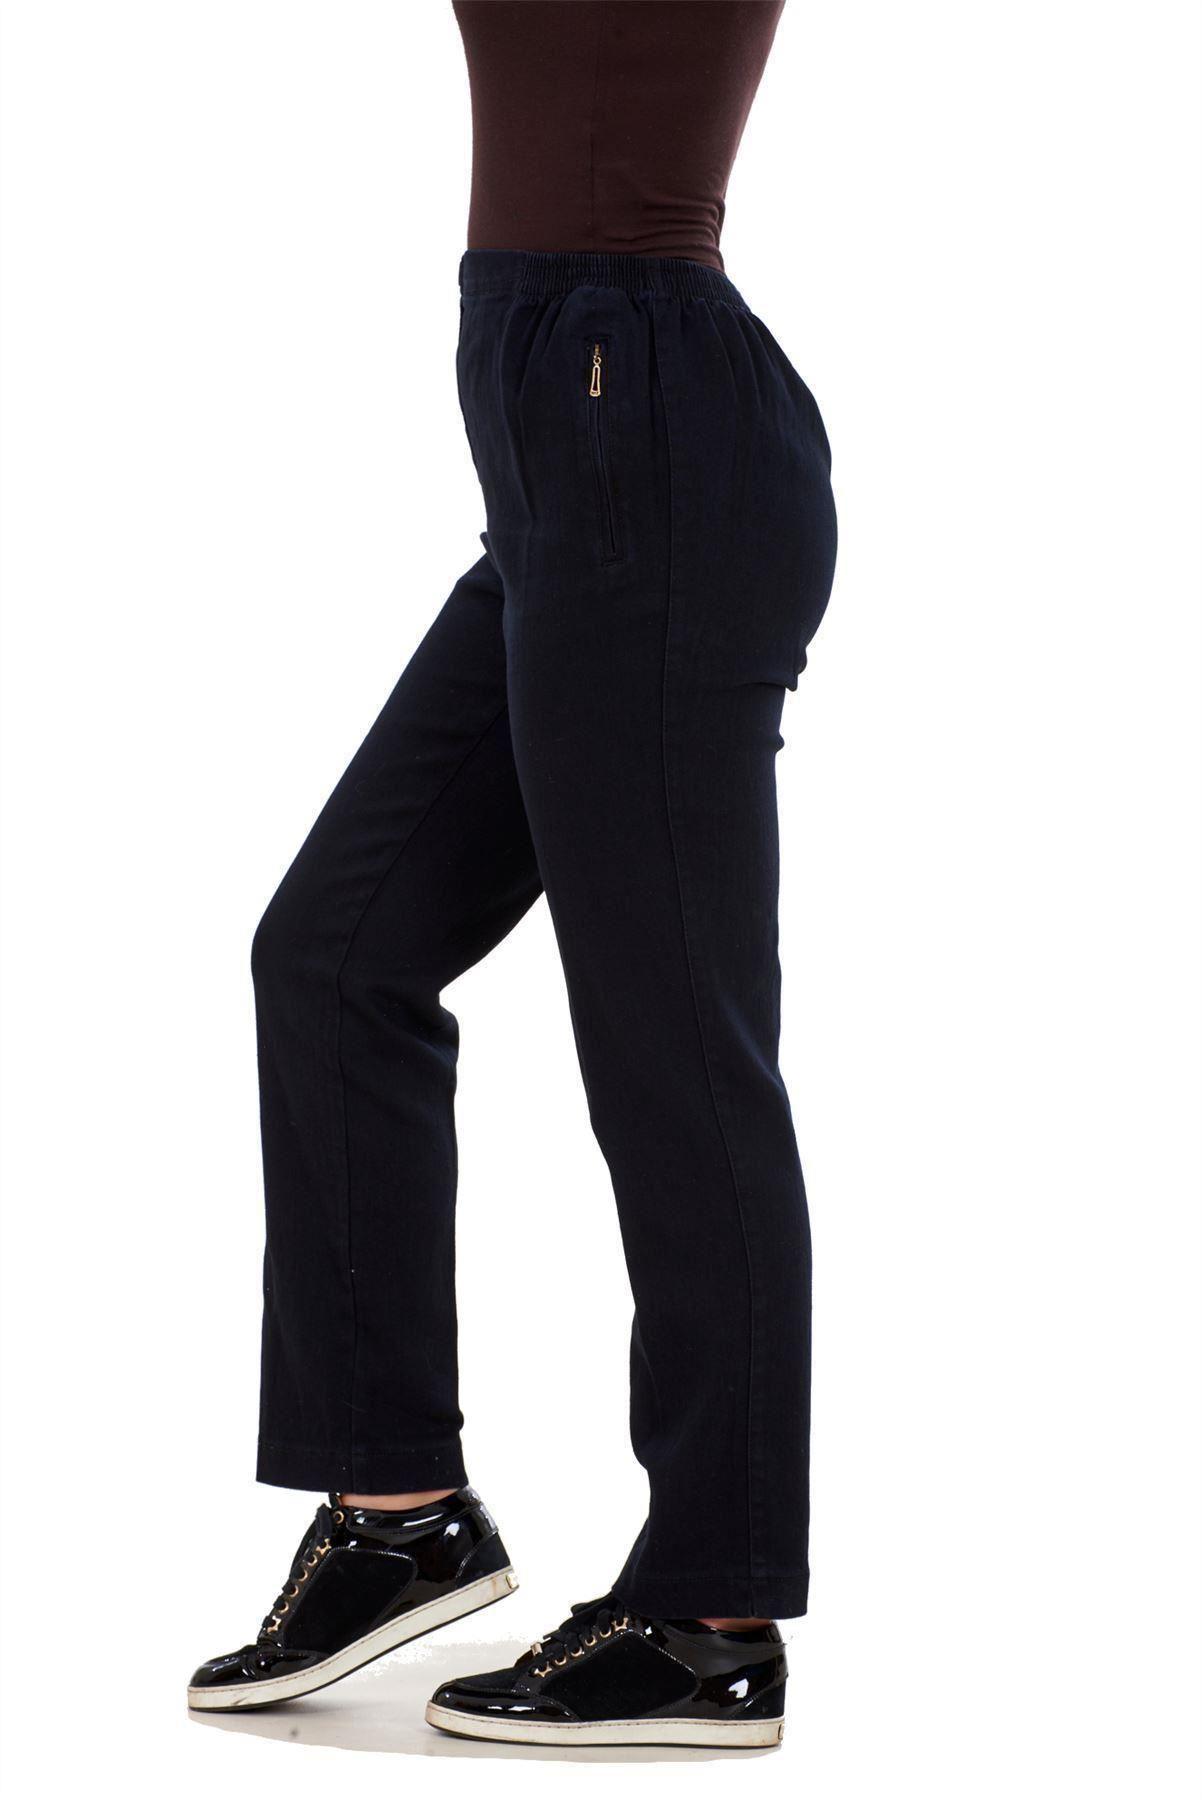 Ladies-Women-Trousers-Rayon-Cotton-Pockets-Elasticated-Stretch-Black-pants-8-24 thumbnail 7